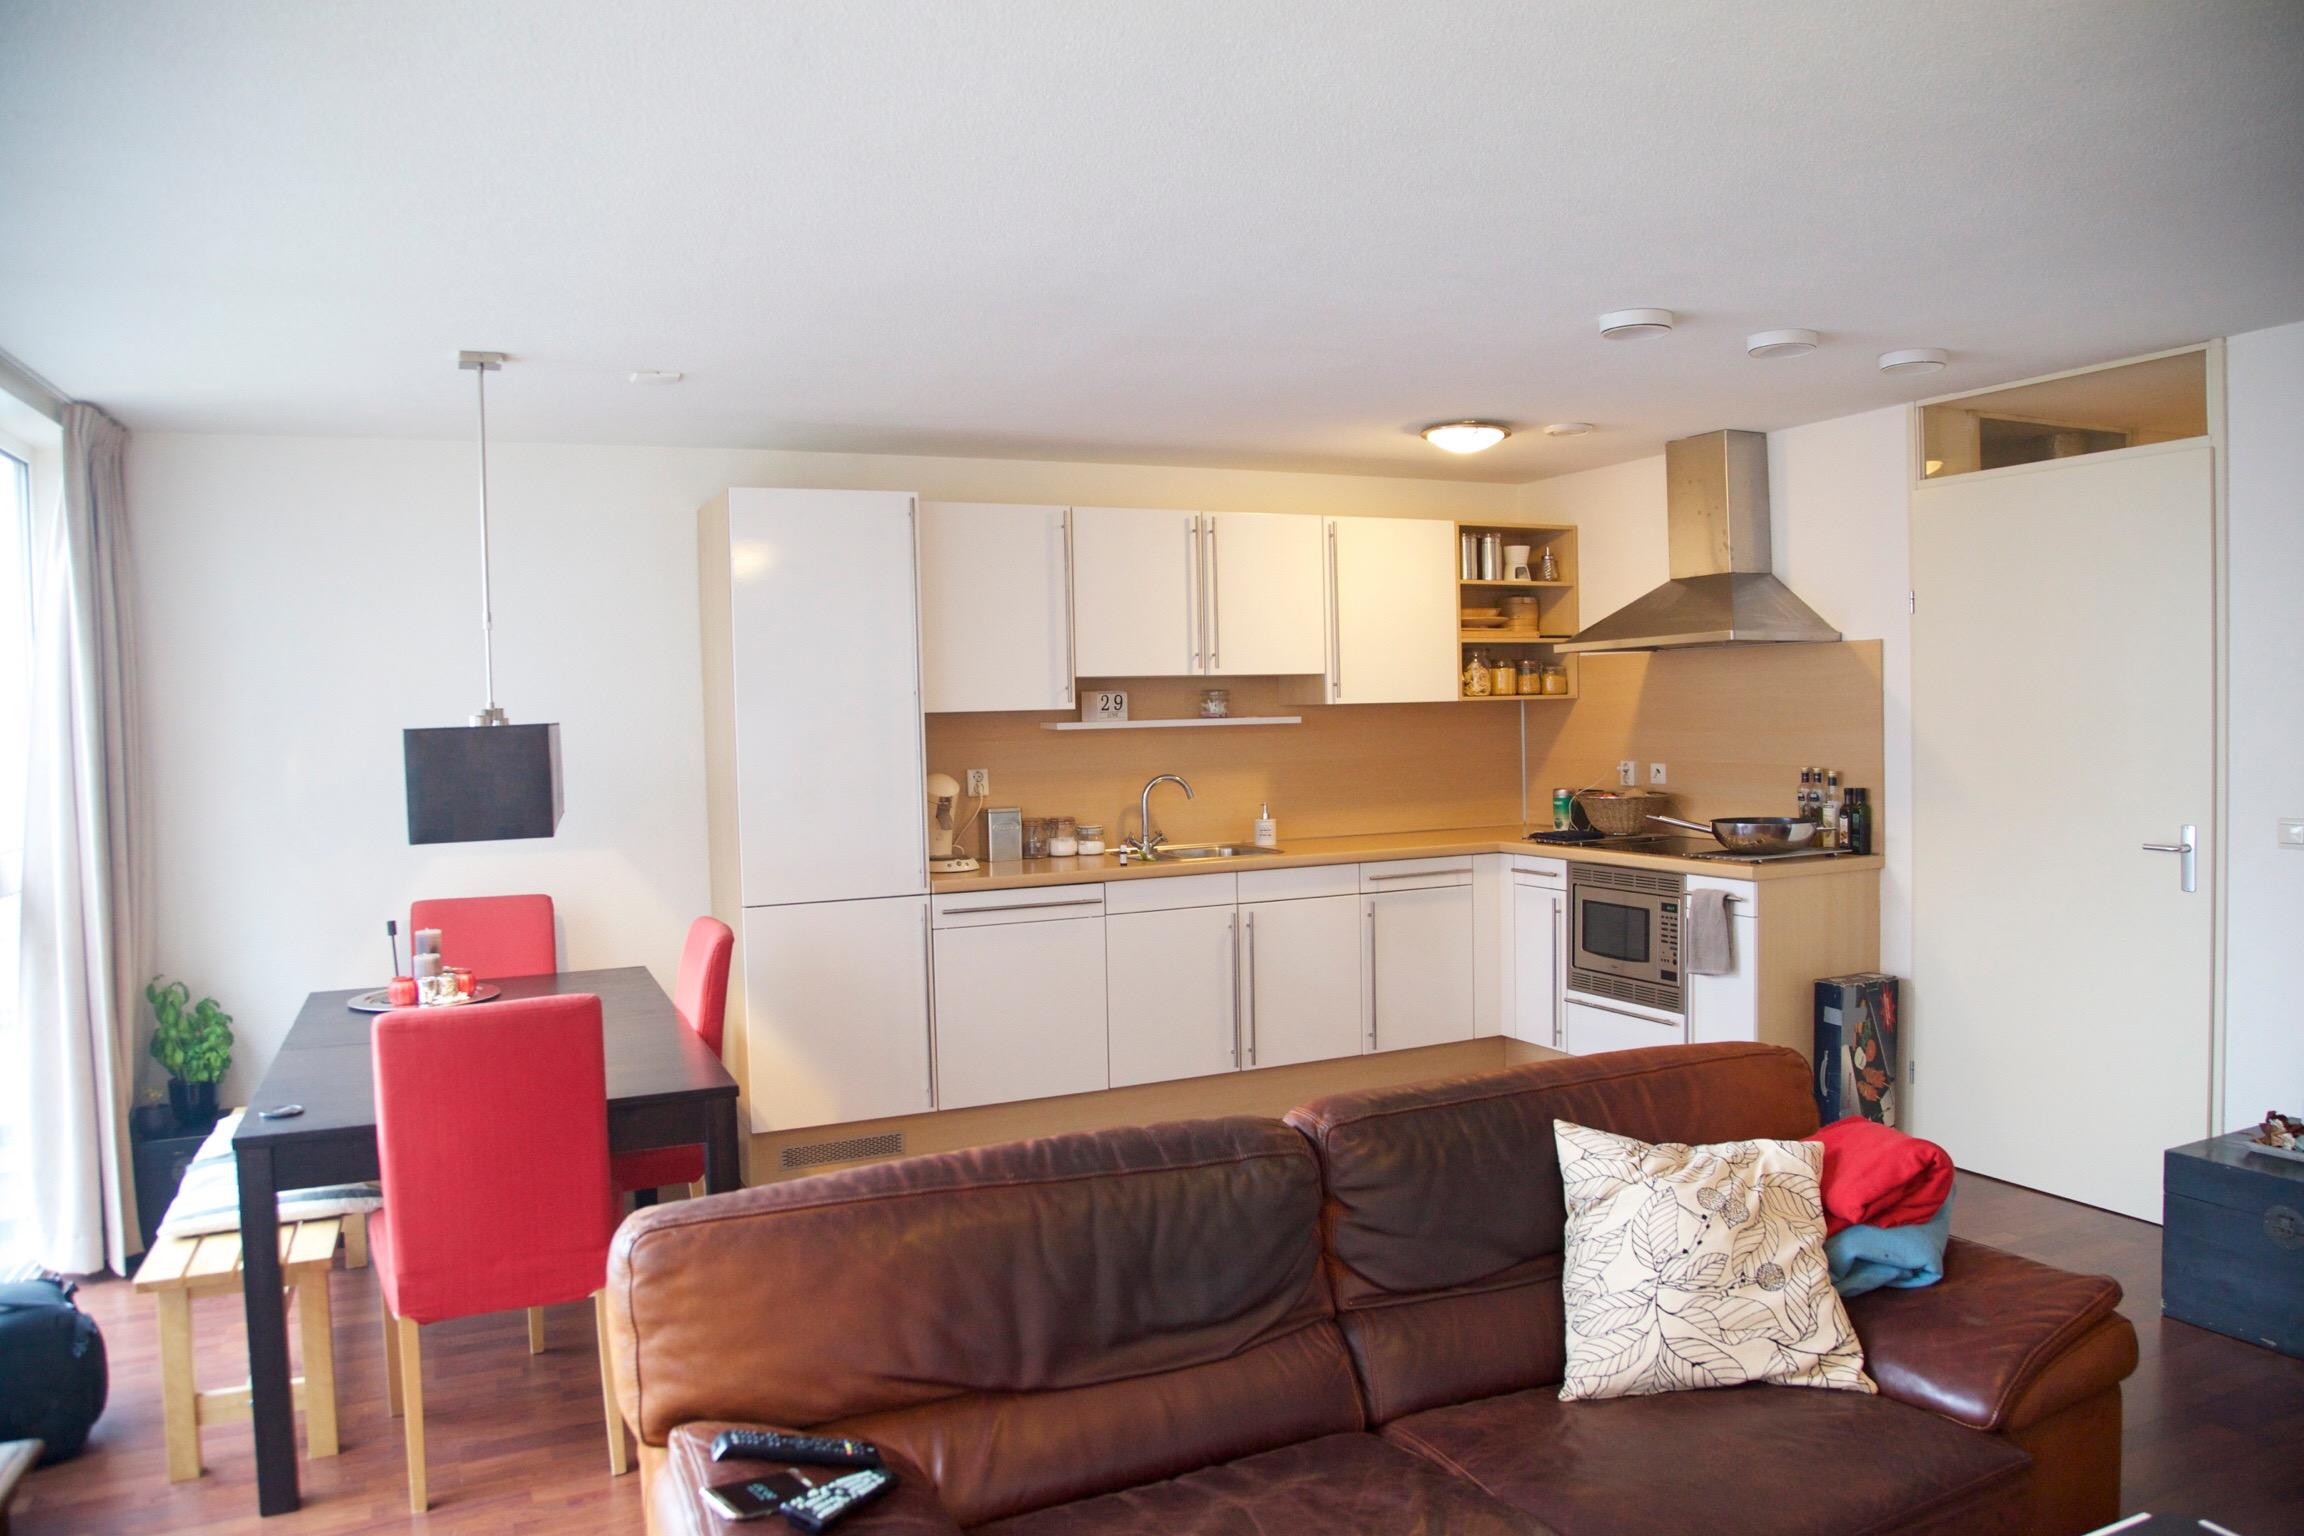 Appartement – jaimyinterieur